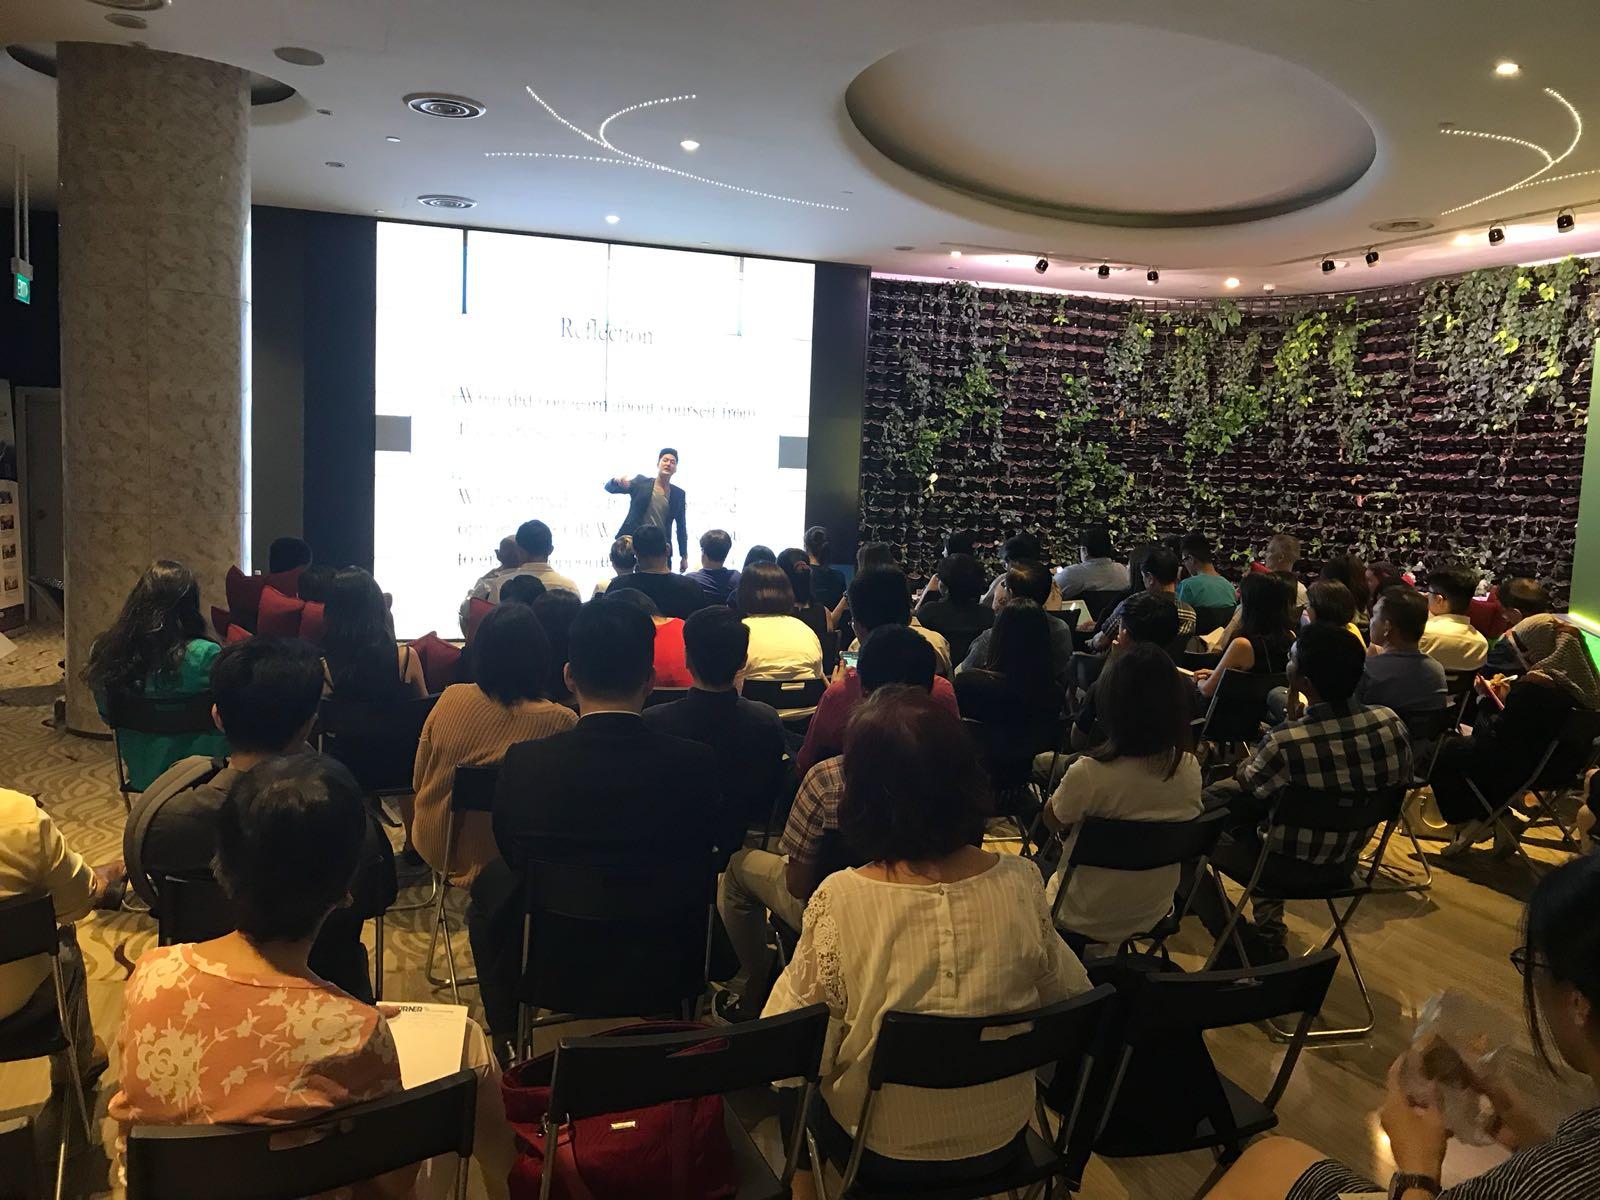 Alaric Ong conducint a seminar to 80 people